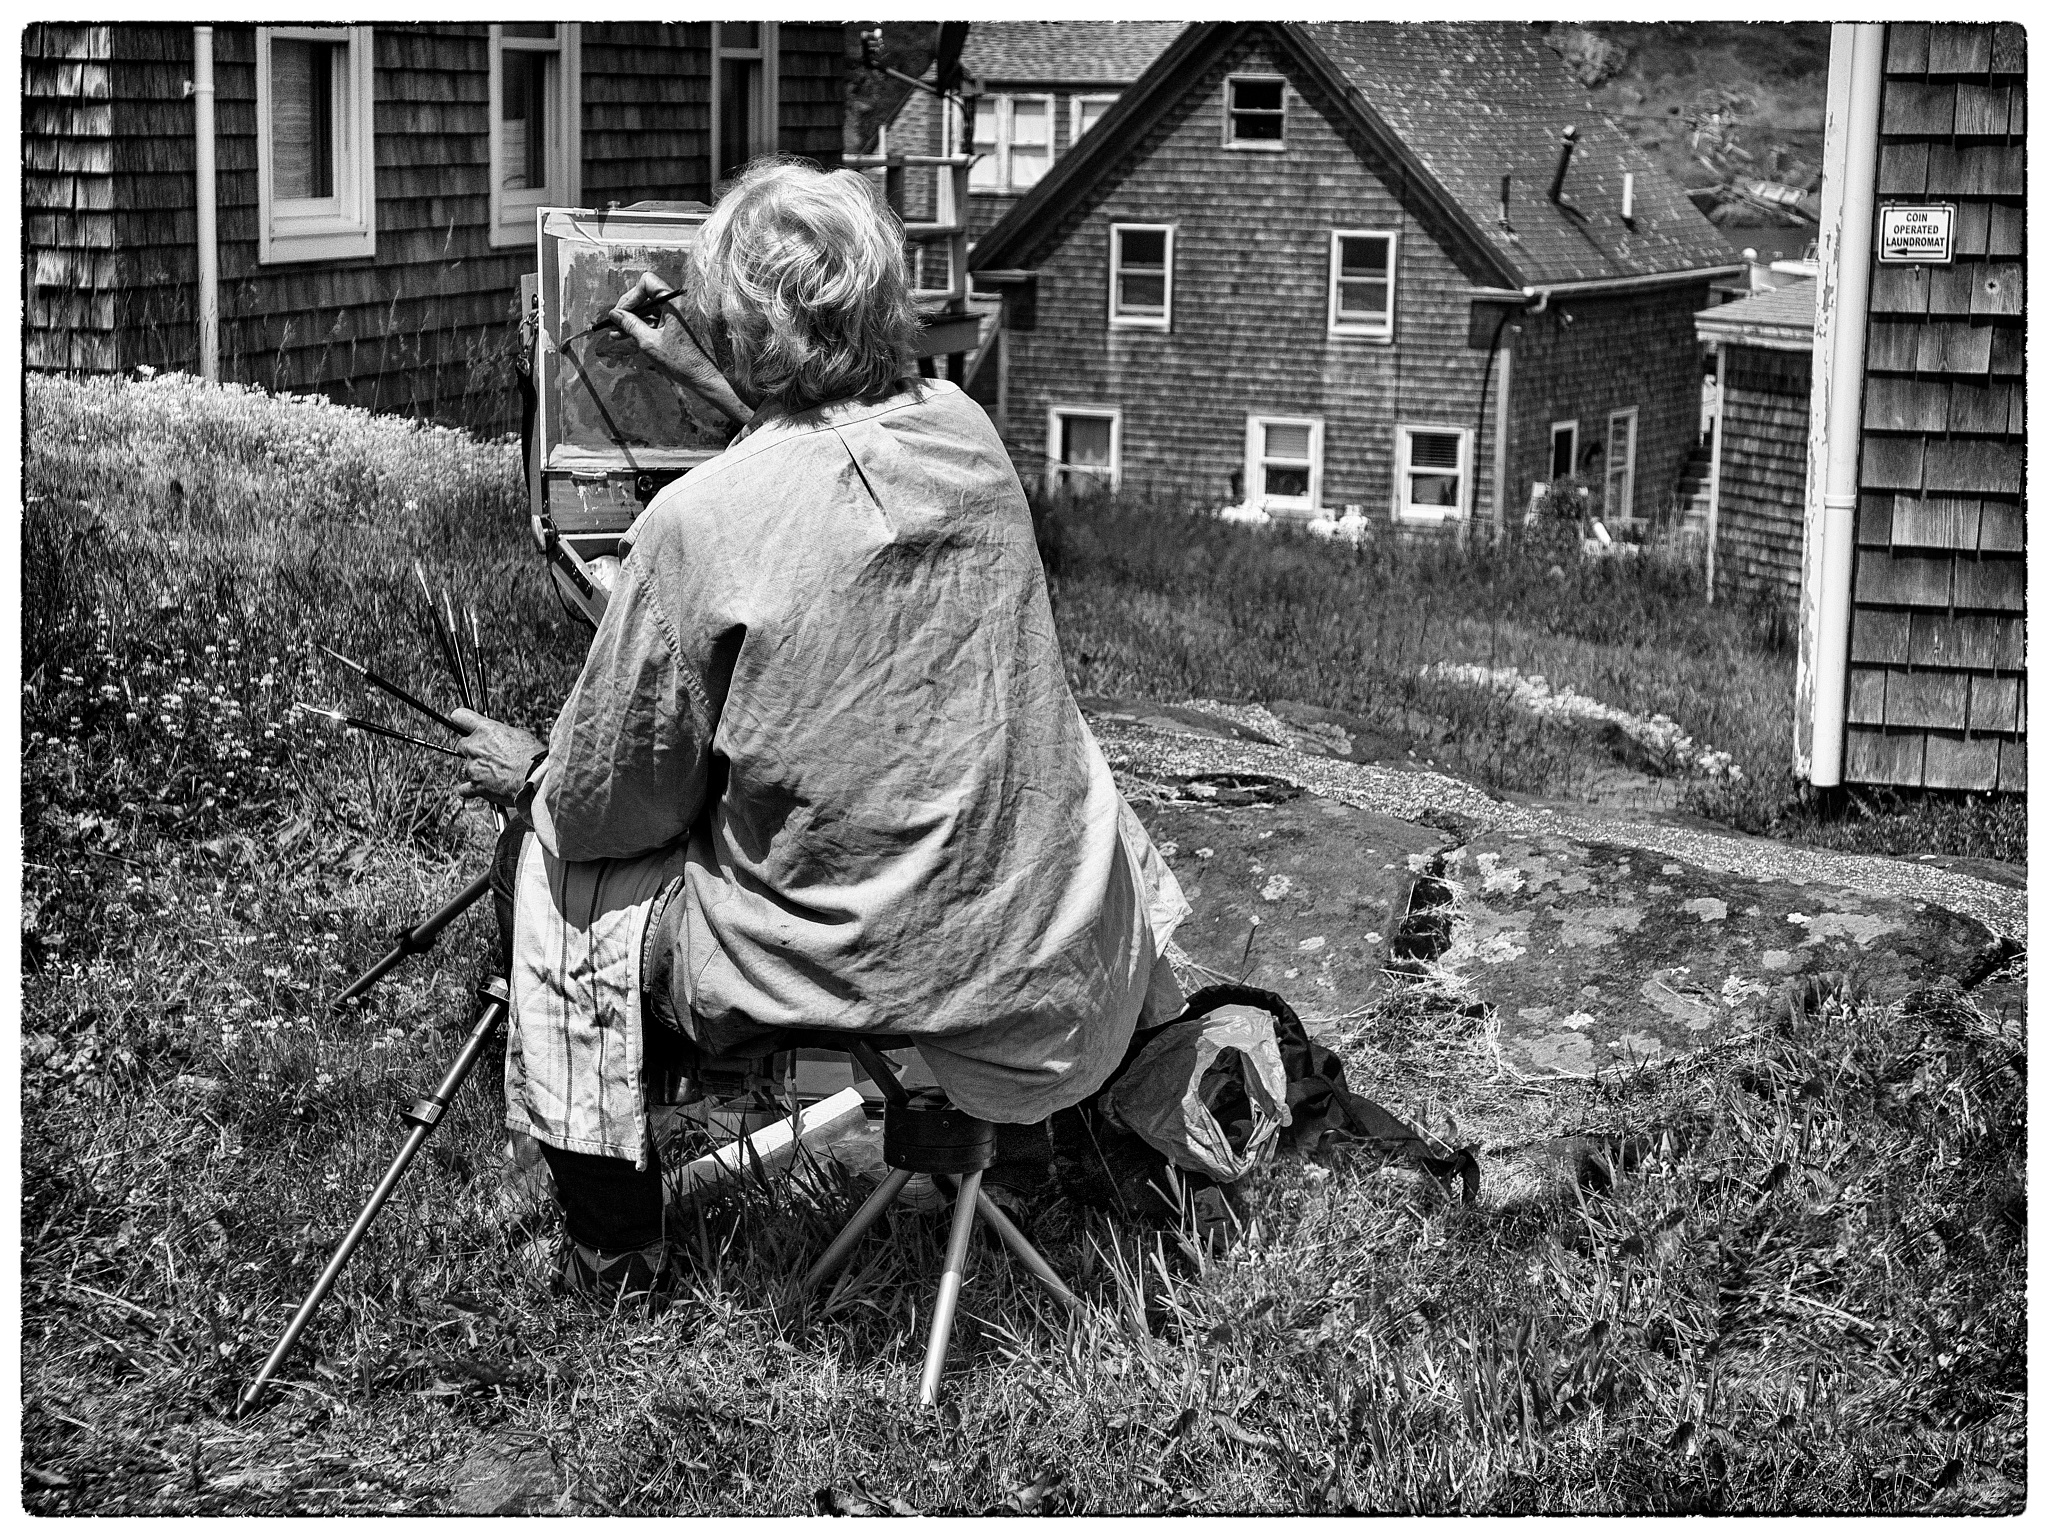 Artist, Tuesday Morning, Monhegan Island, Maine. June 2016 by Carol-Lynn Rössel